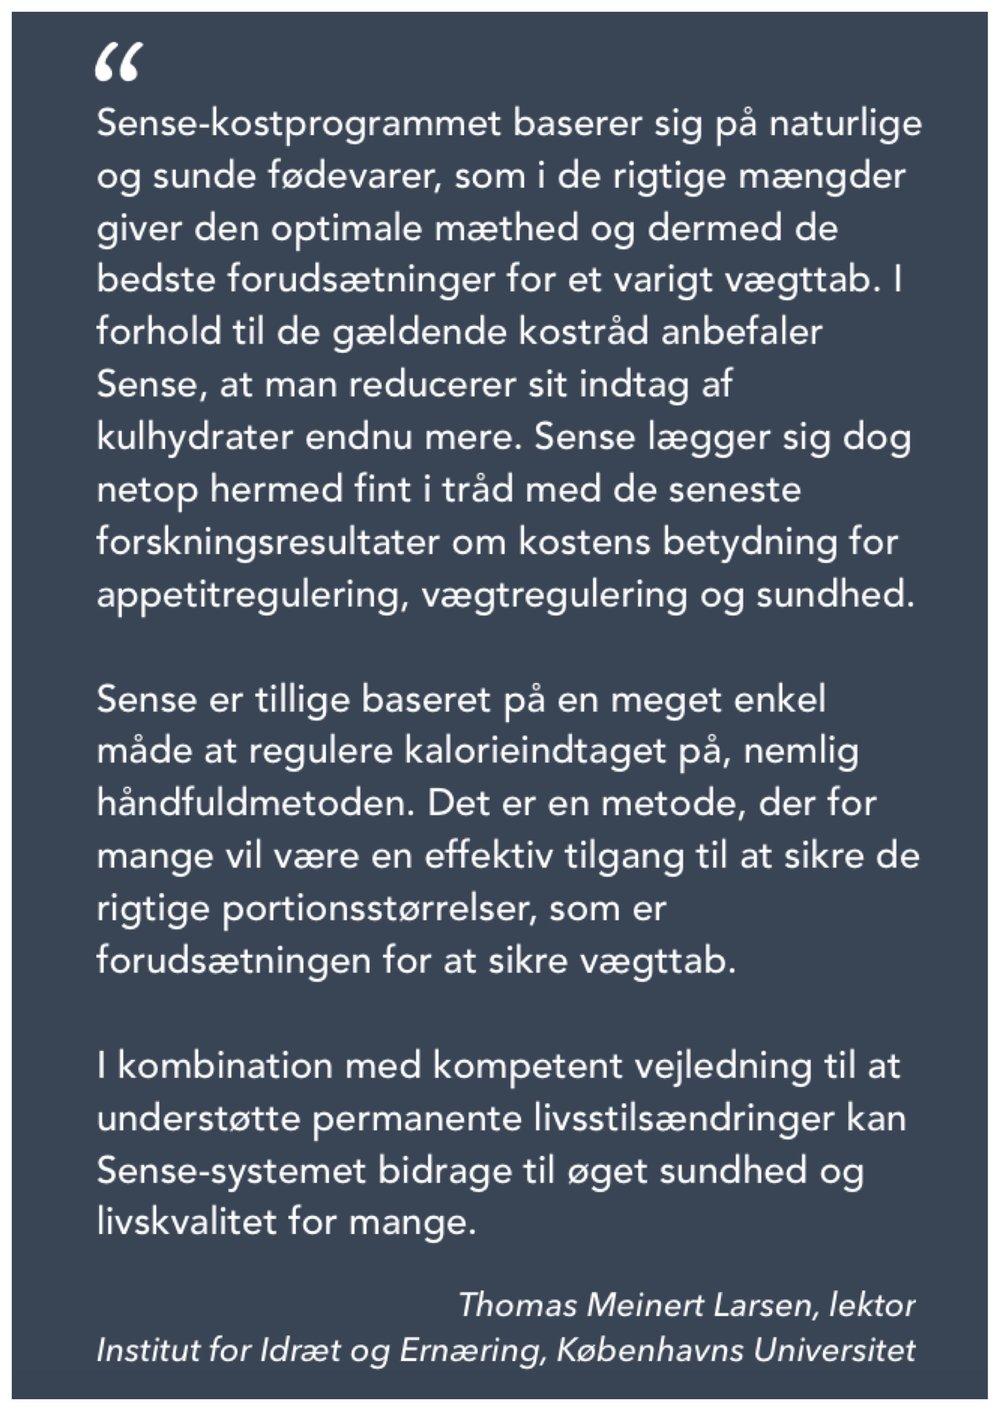 Udtalelse, Thomas Meinert Larsen.jpg